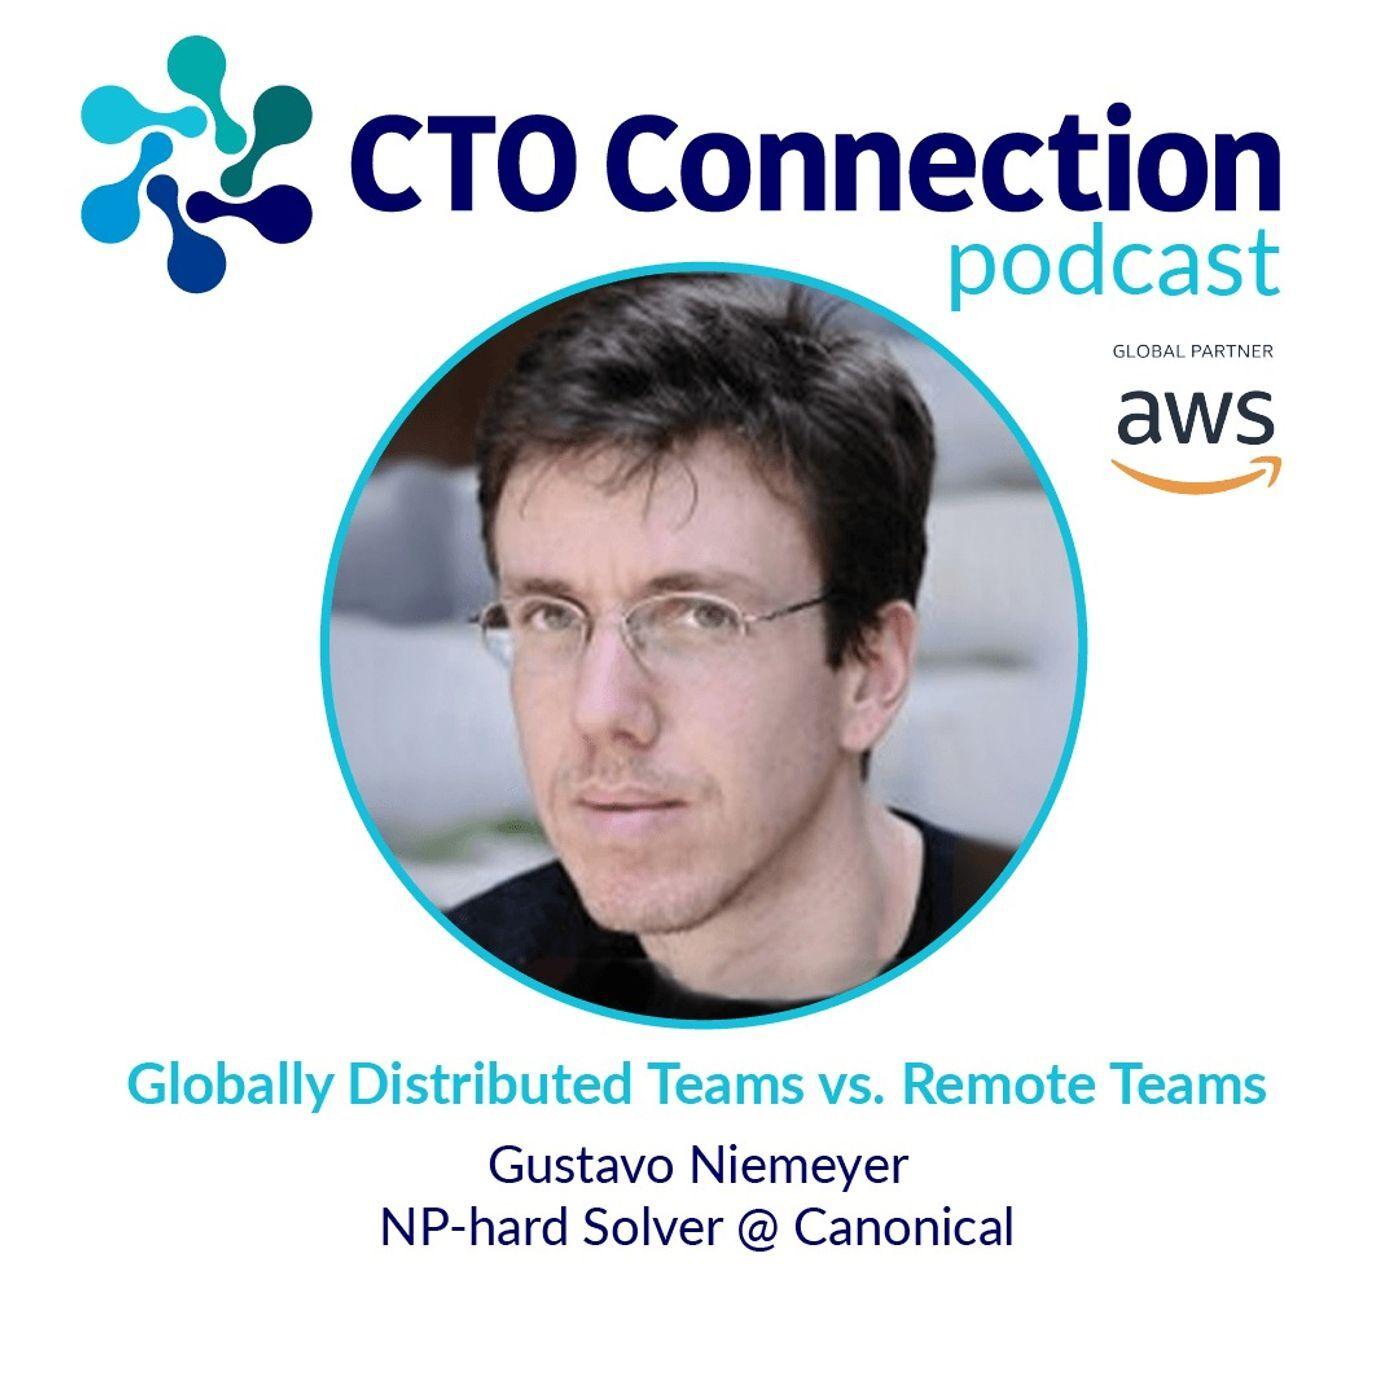 Globally Distributed Teams vs. Remote Teams with Gustavo Niemeyer